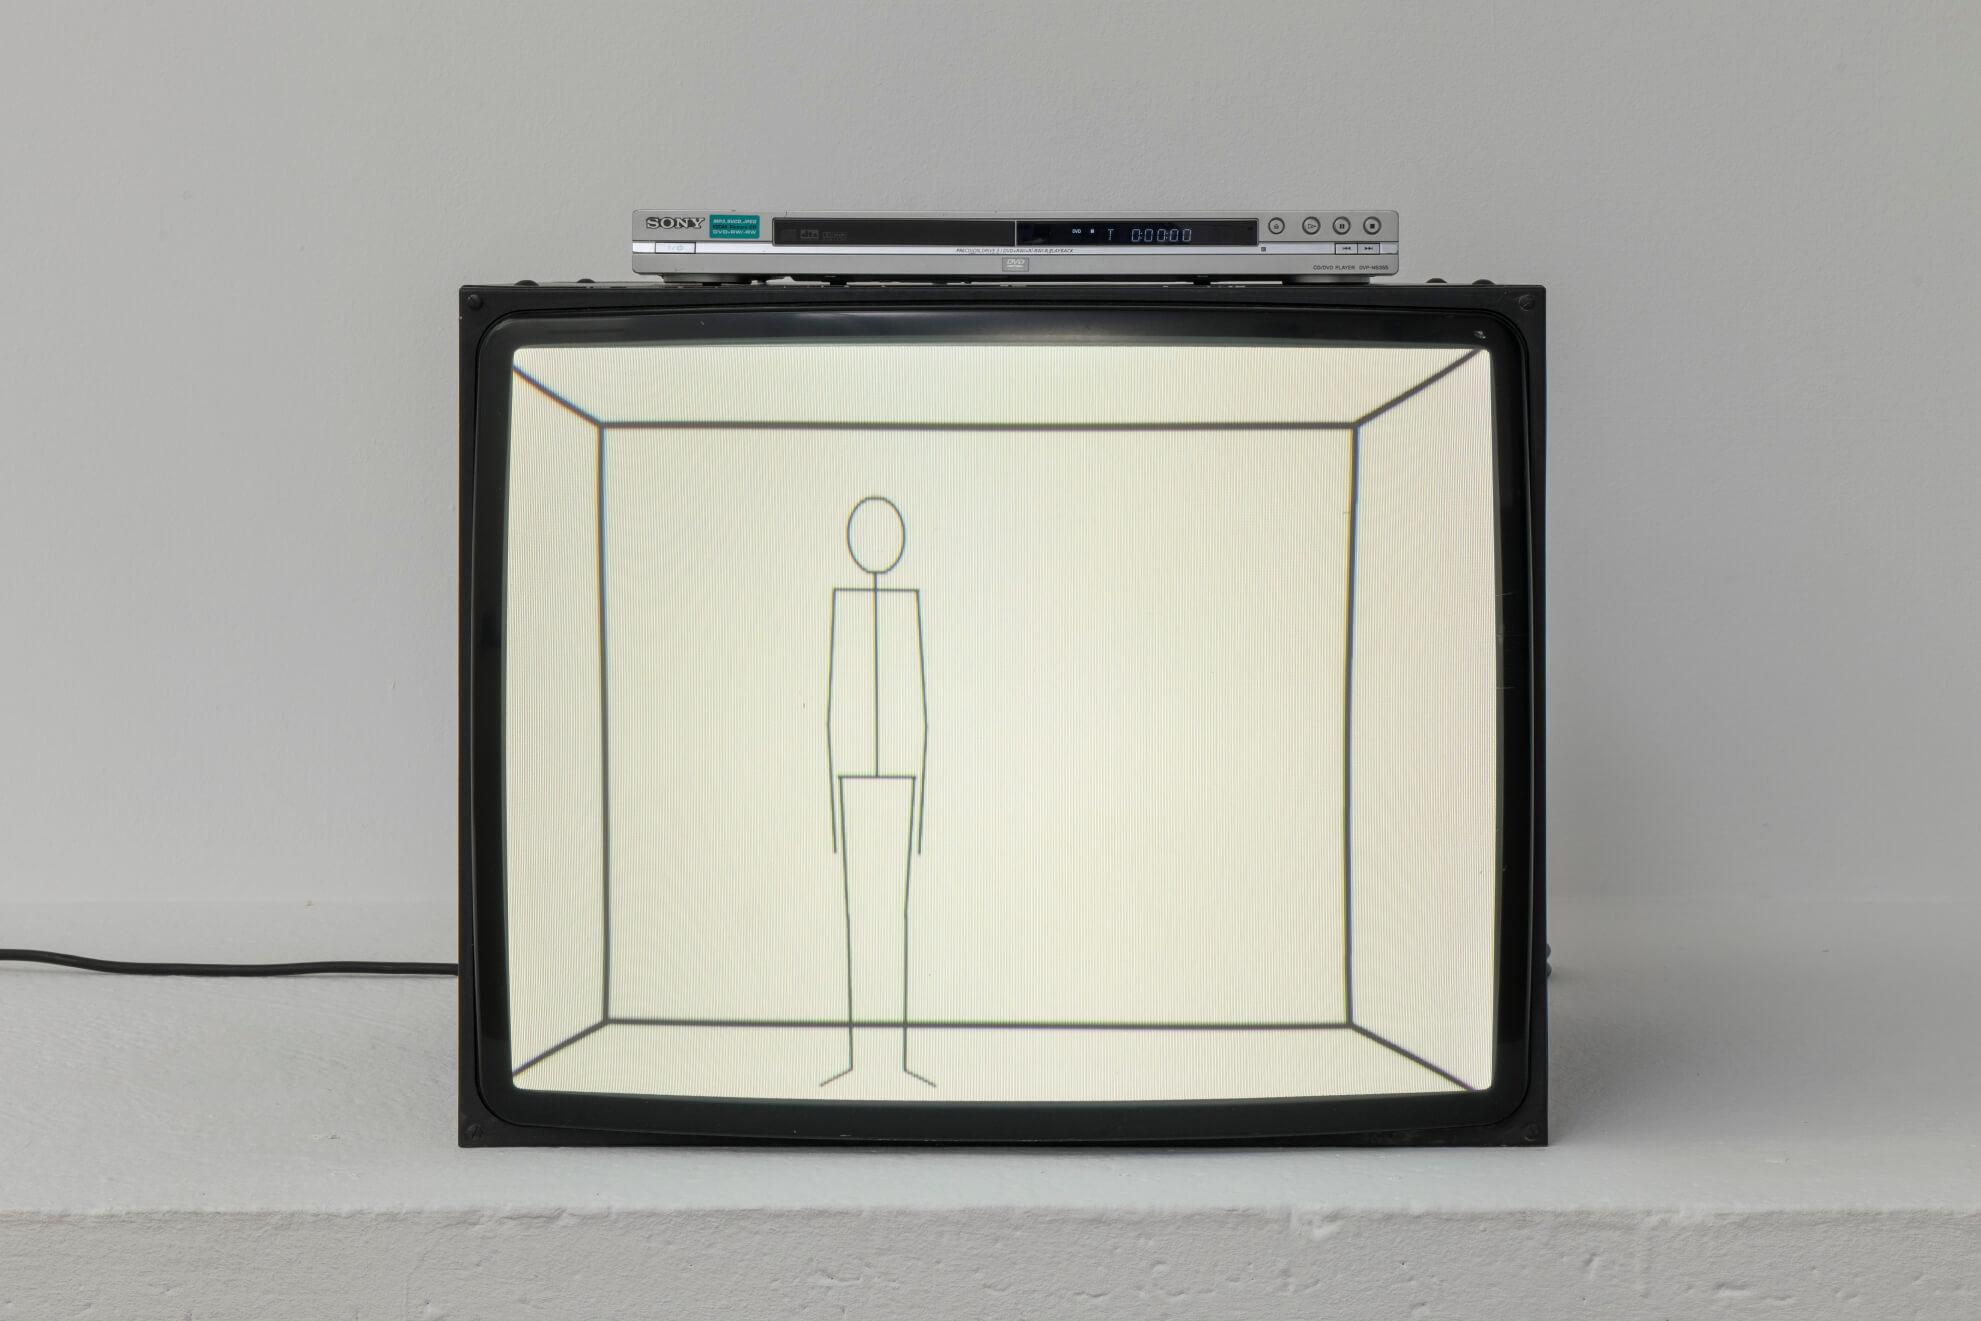 MATT MULLICAN. Untitled (Animated Fictional Details: Dying Stick Figure), 2012 | Lara Fluxà: Delu / Accrochage #5: Set Petites Històries | ProjecteSD